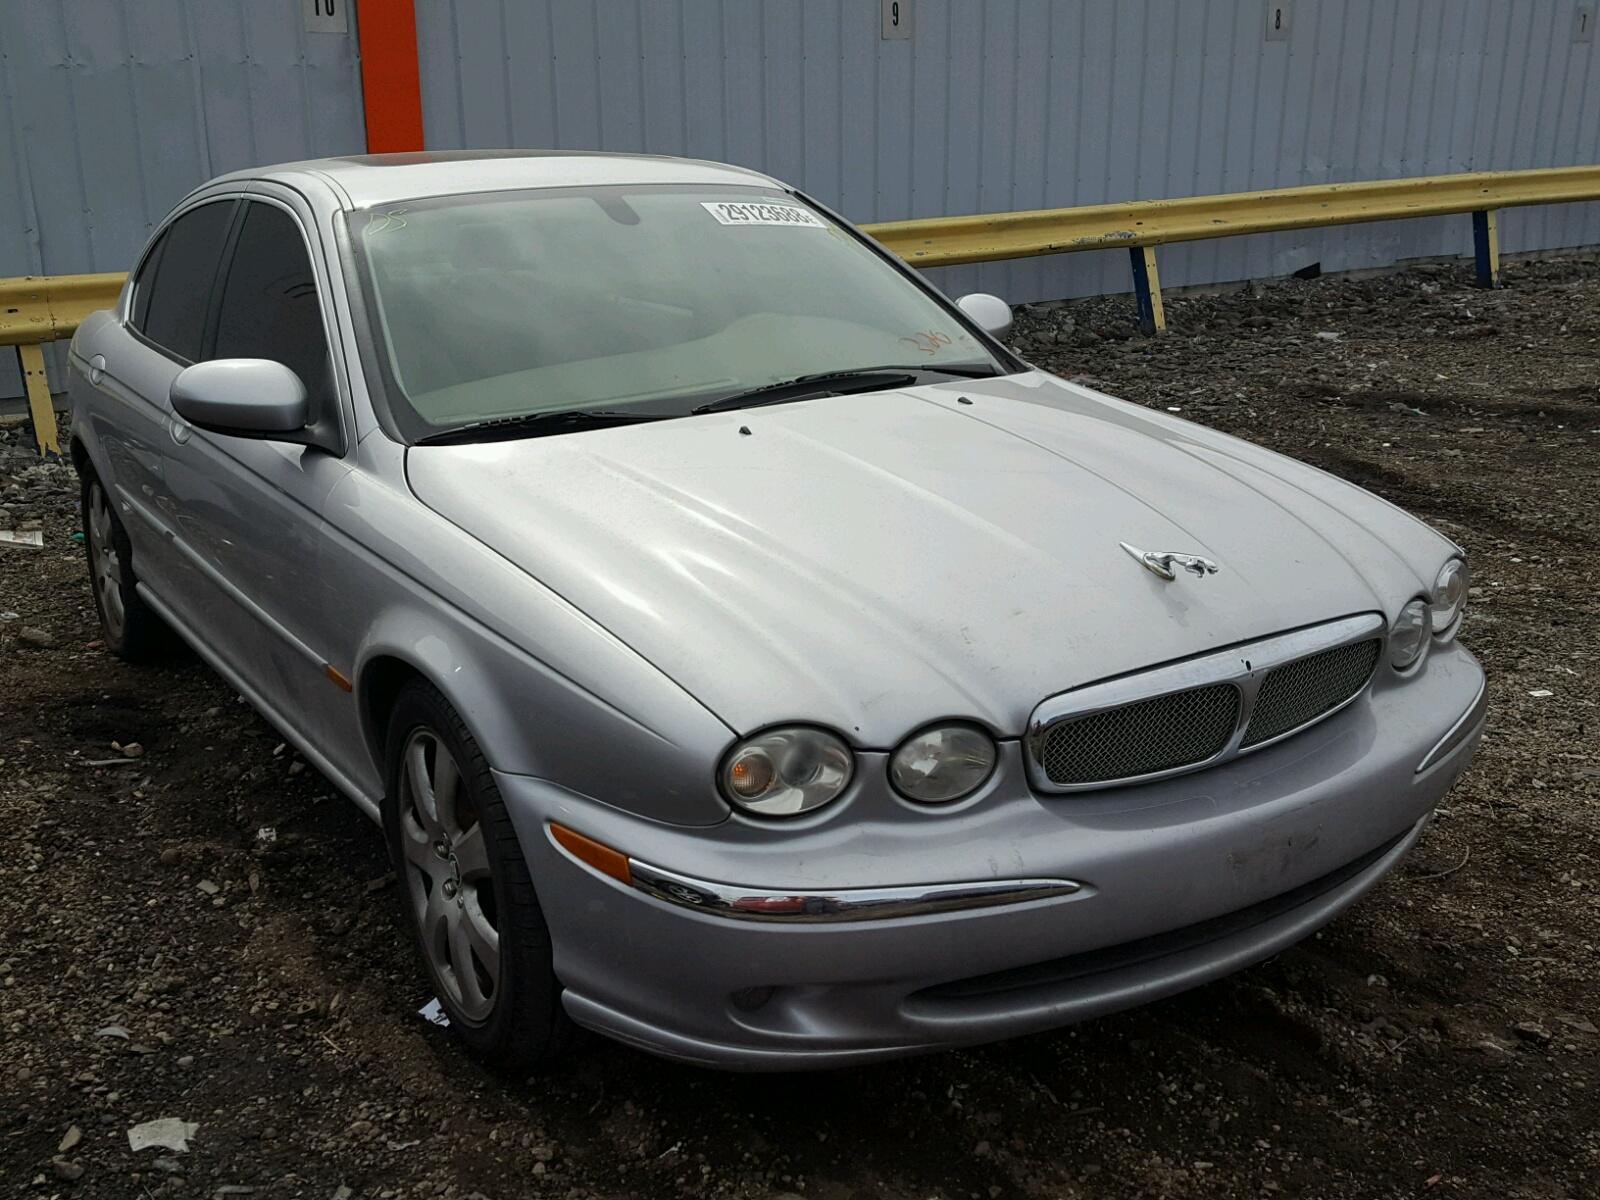 large milu cc c view for in listings florida lakeland std jaguar of com sale type picture x classiccars